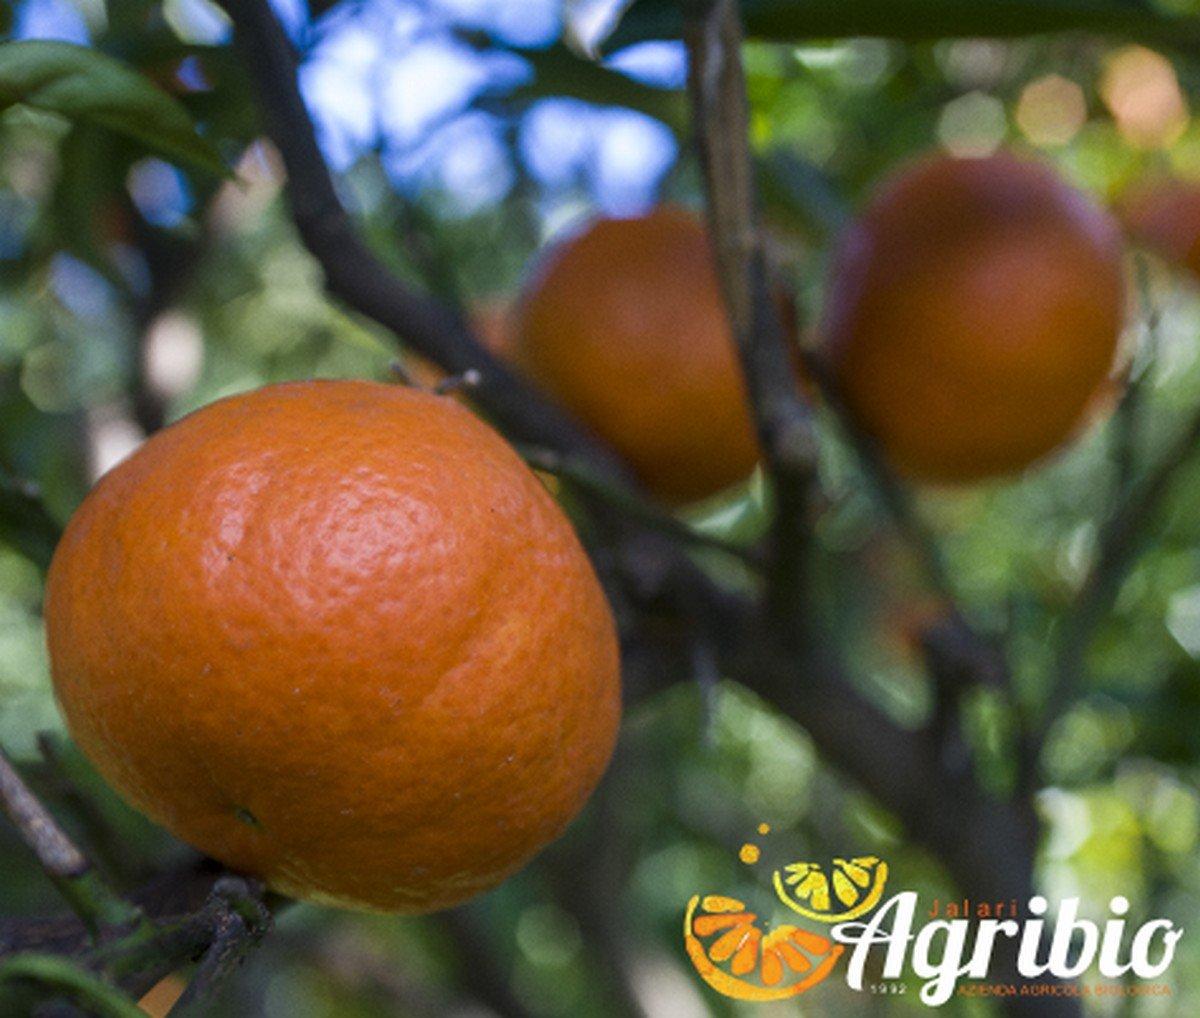 Azienda agricola biologica jalari - Agrumi biologici siciliani - clementine nova